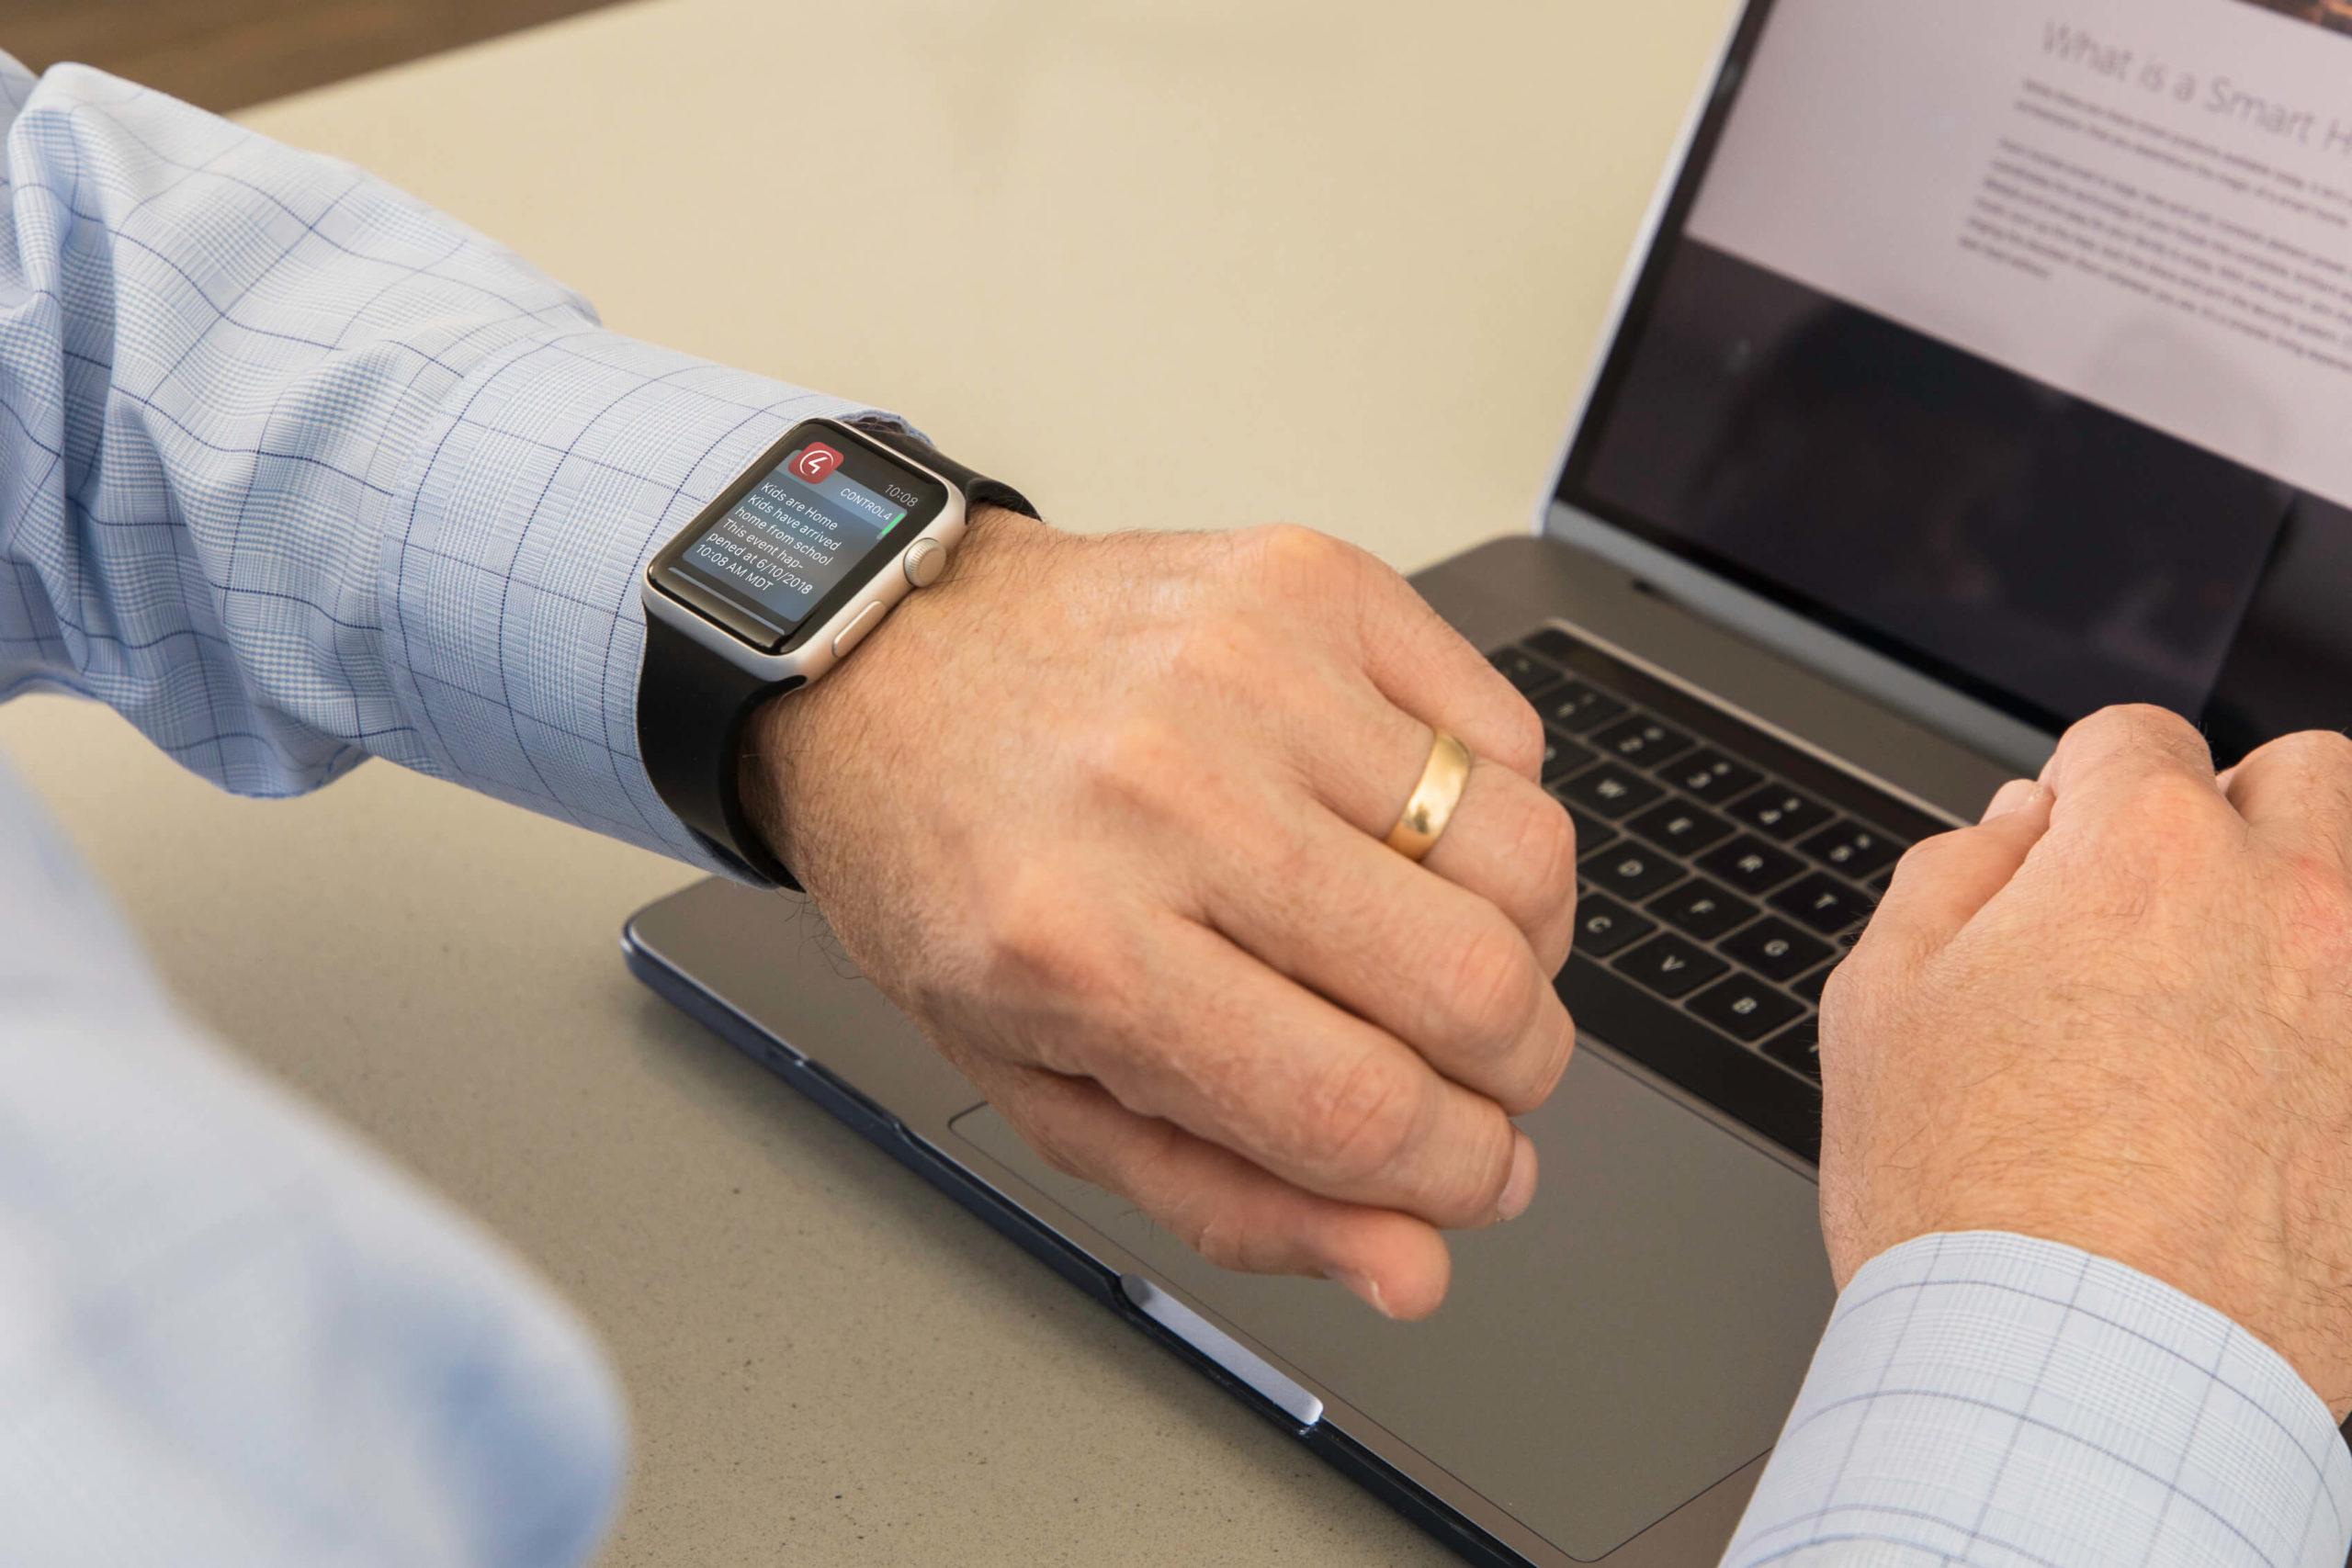 control4 smart watch